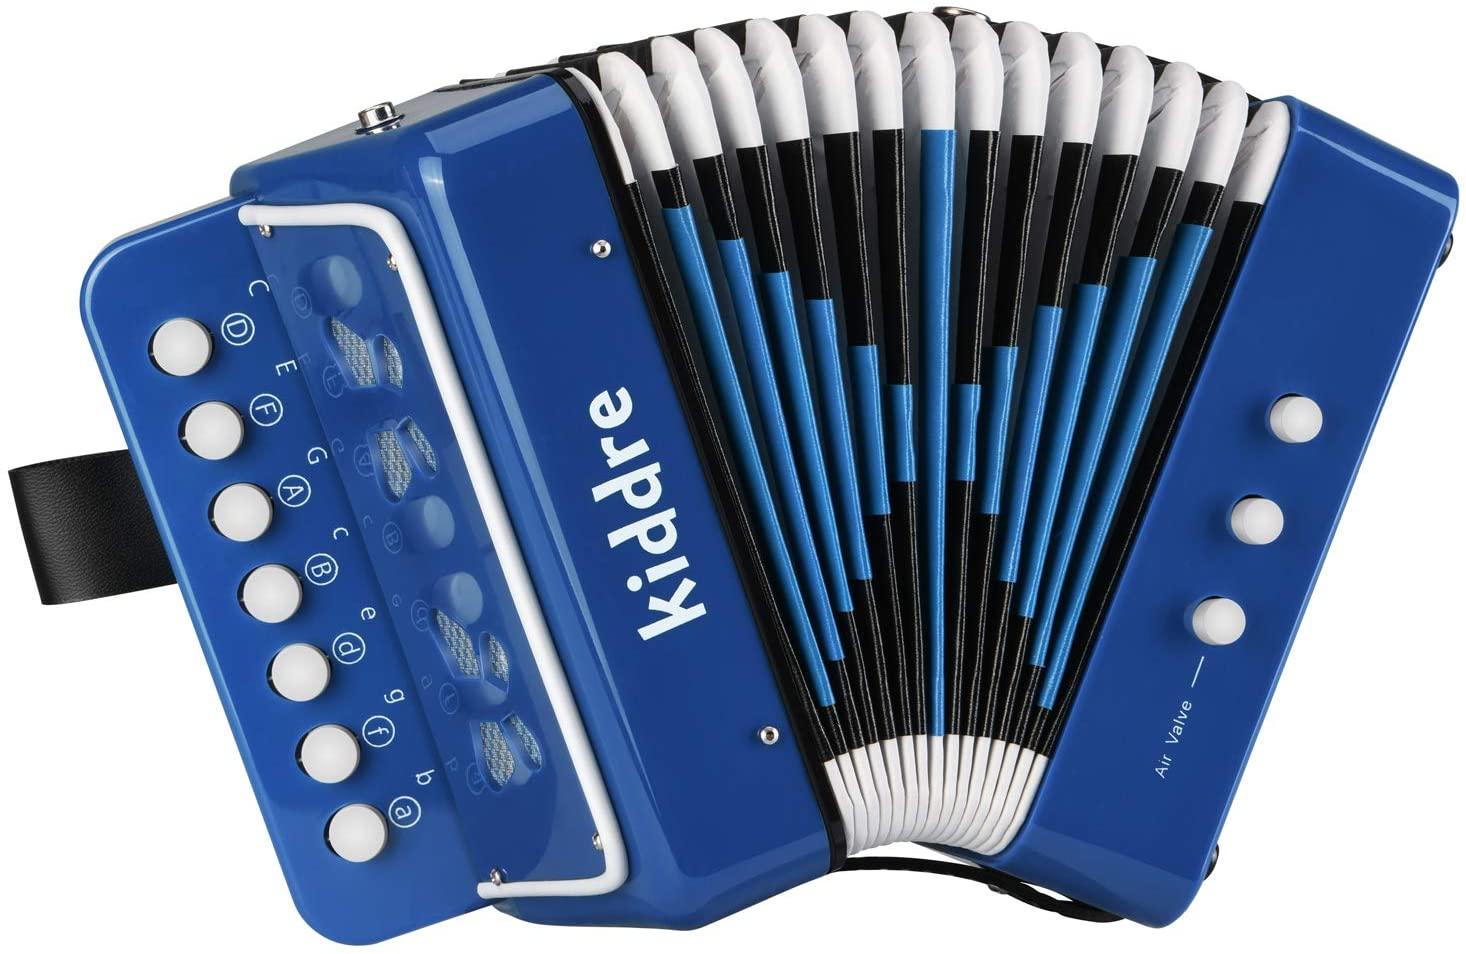 Kiddire Kids Accordion, 10 Keys Button Toy Accordion Musical Instruments for Children Kids Pre-Kindergarten Toddlers Beginners(Blue)